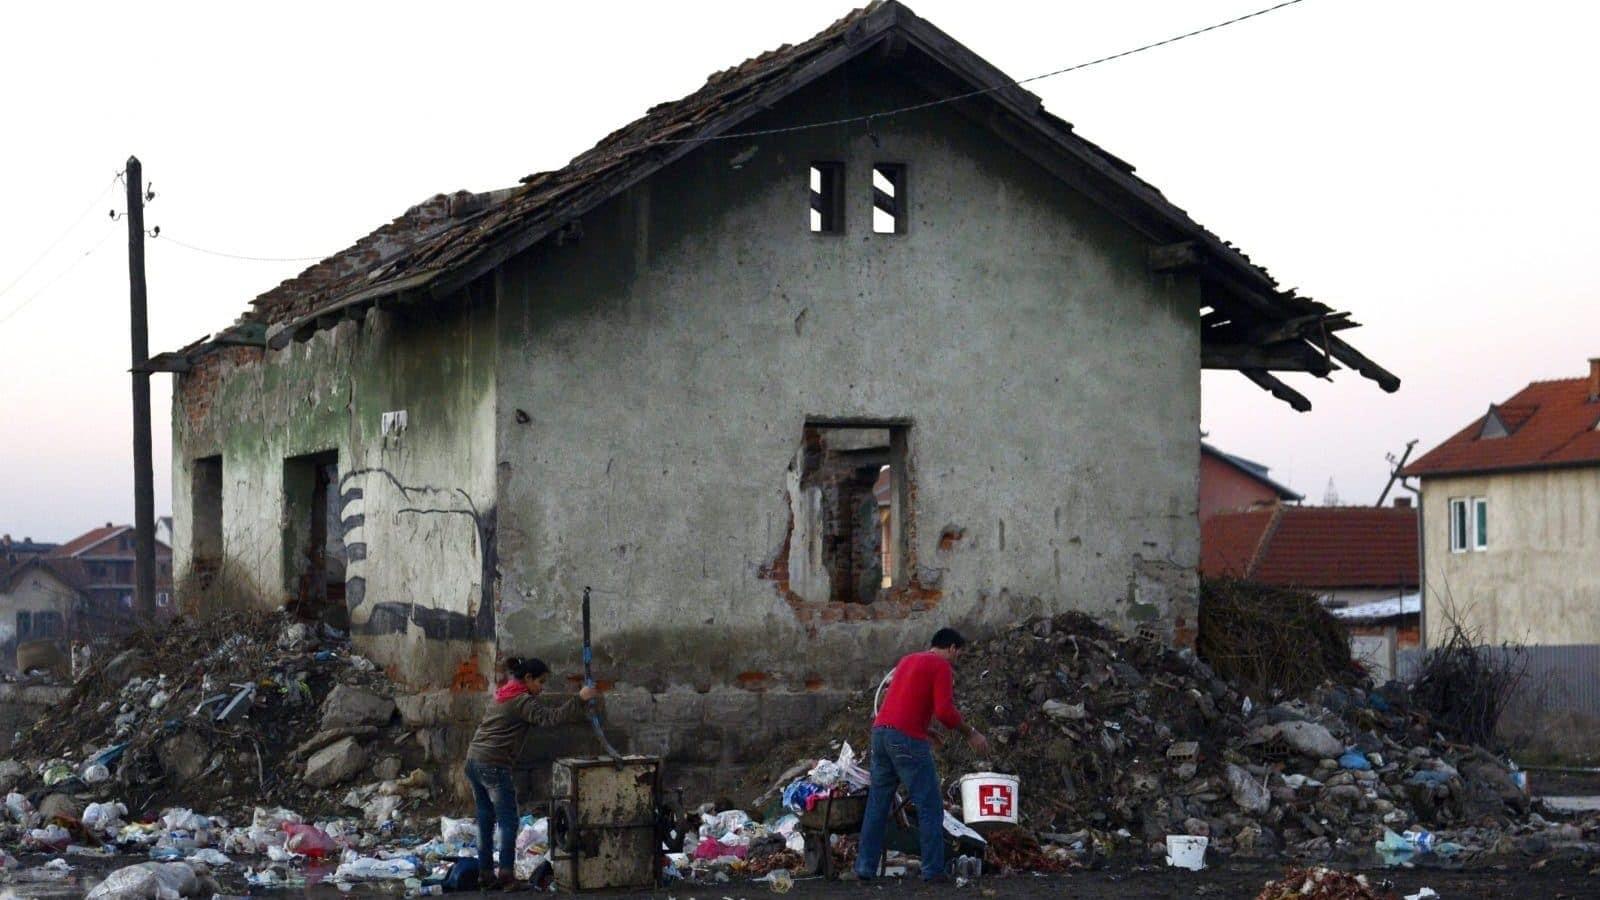 Romi u Podujevu, Kosovo, blizu srpske granice, 2015. (Foto: EPA / TAMAS KOVACS HUNGARI OUT)